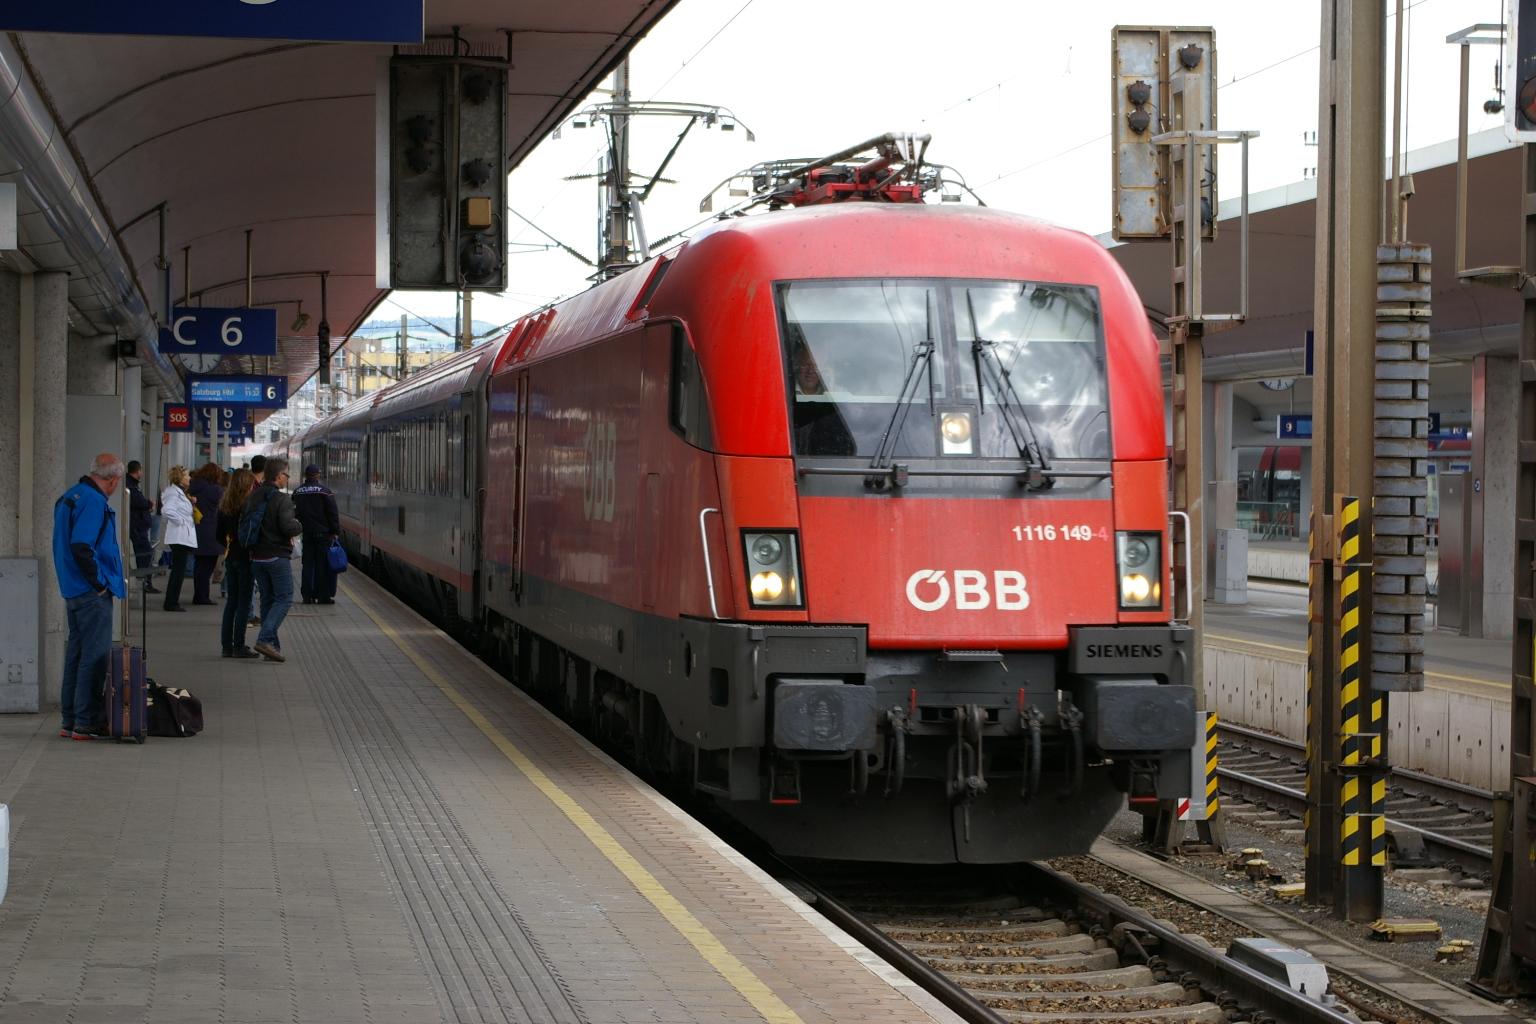 1116 149 nit Zug 546 am 04.05.2014 ankommend in Linz